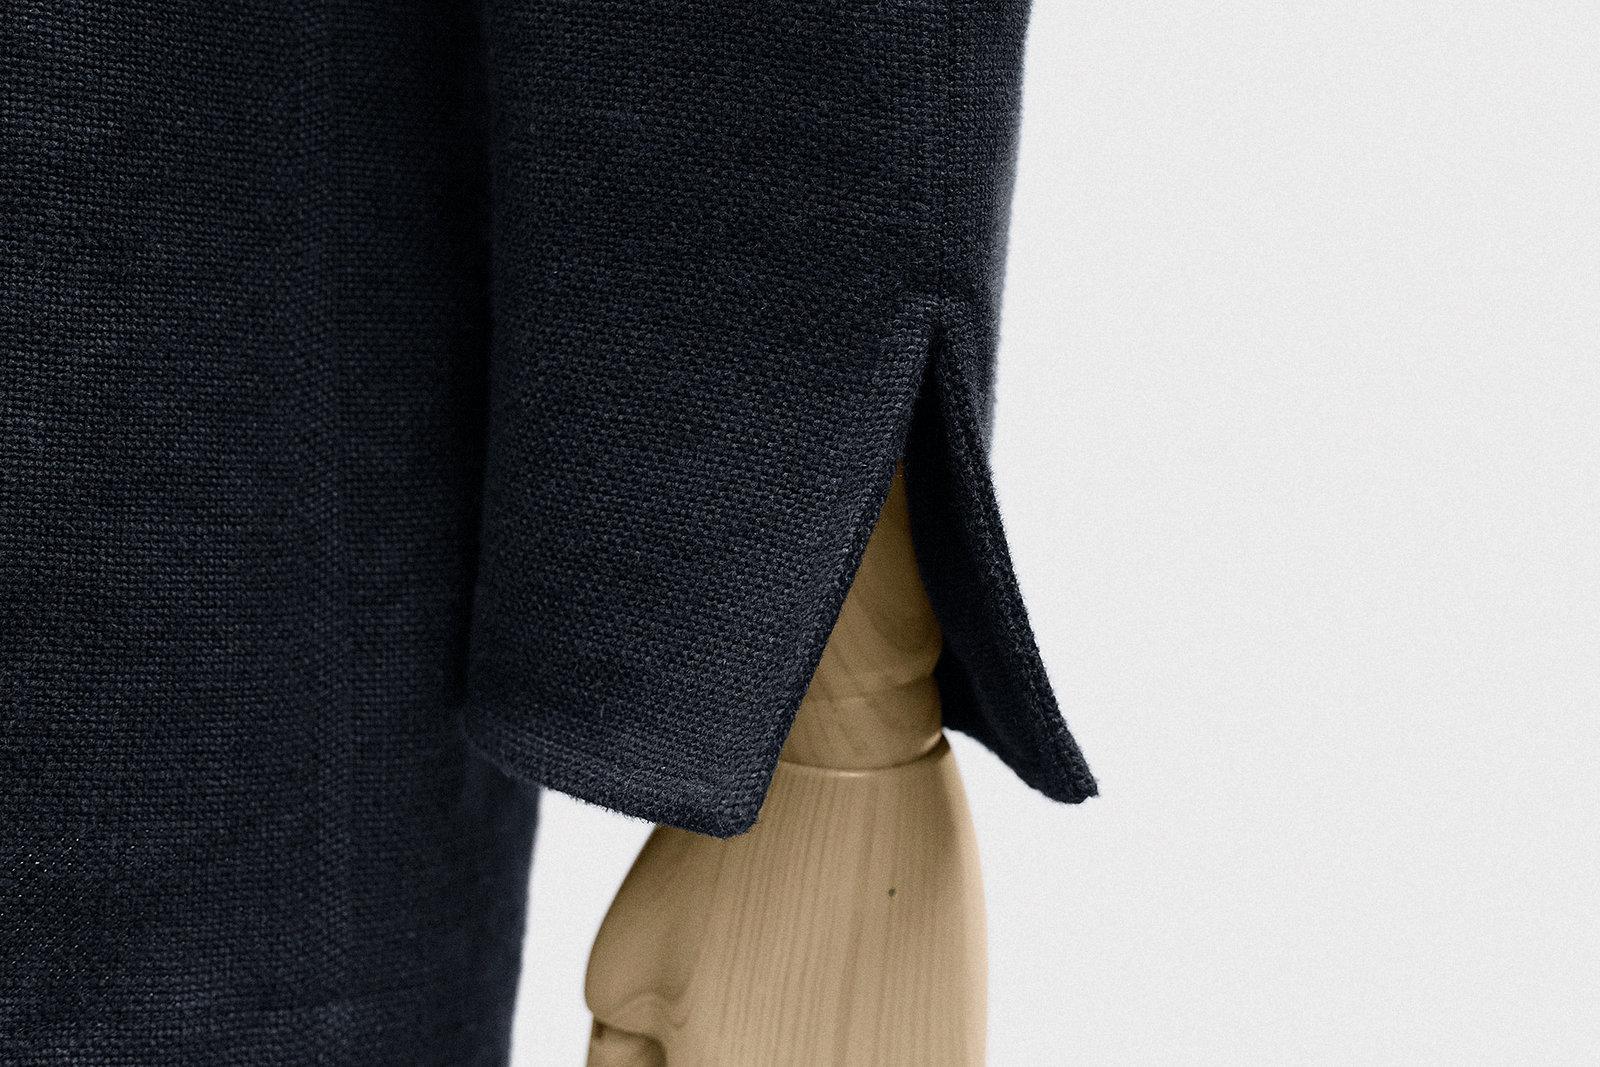 pyjama-top-linen-burlap-dark-navy-6@2x.jpg